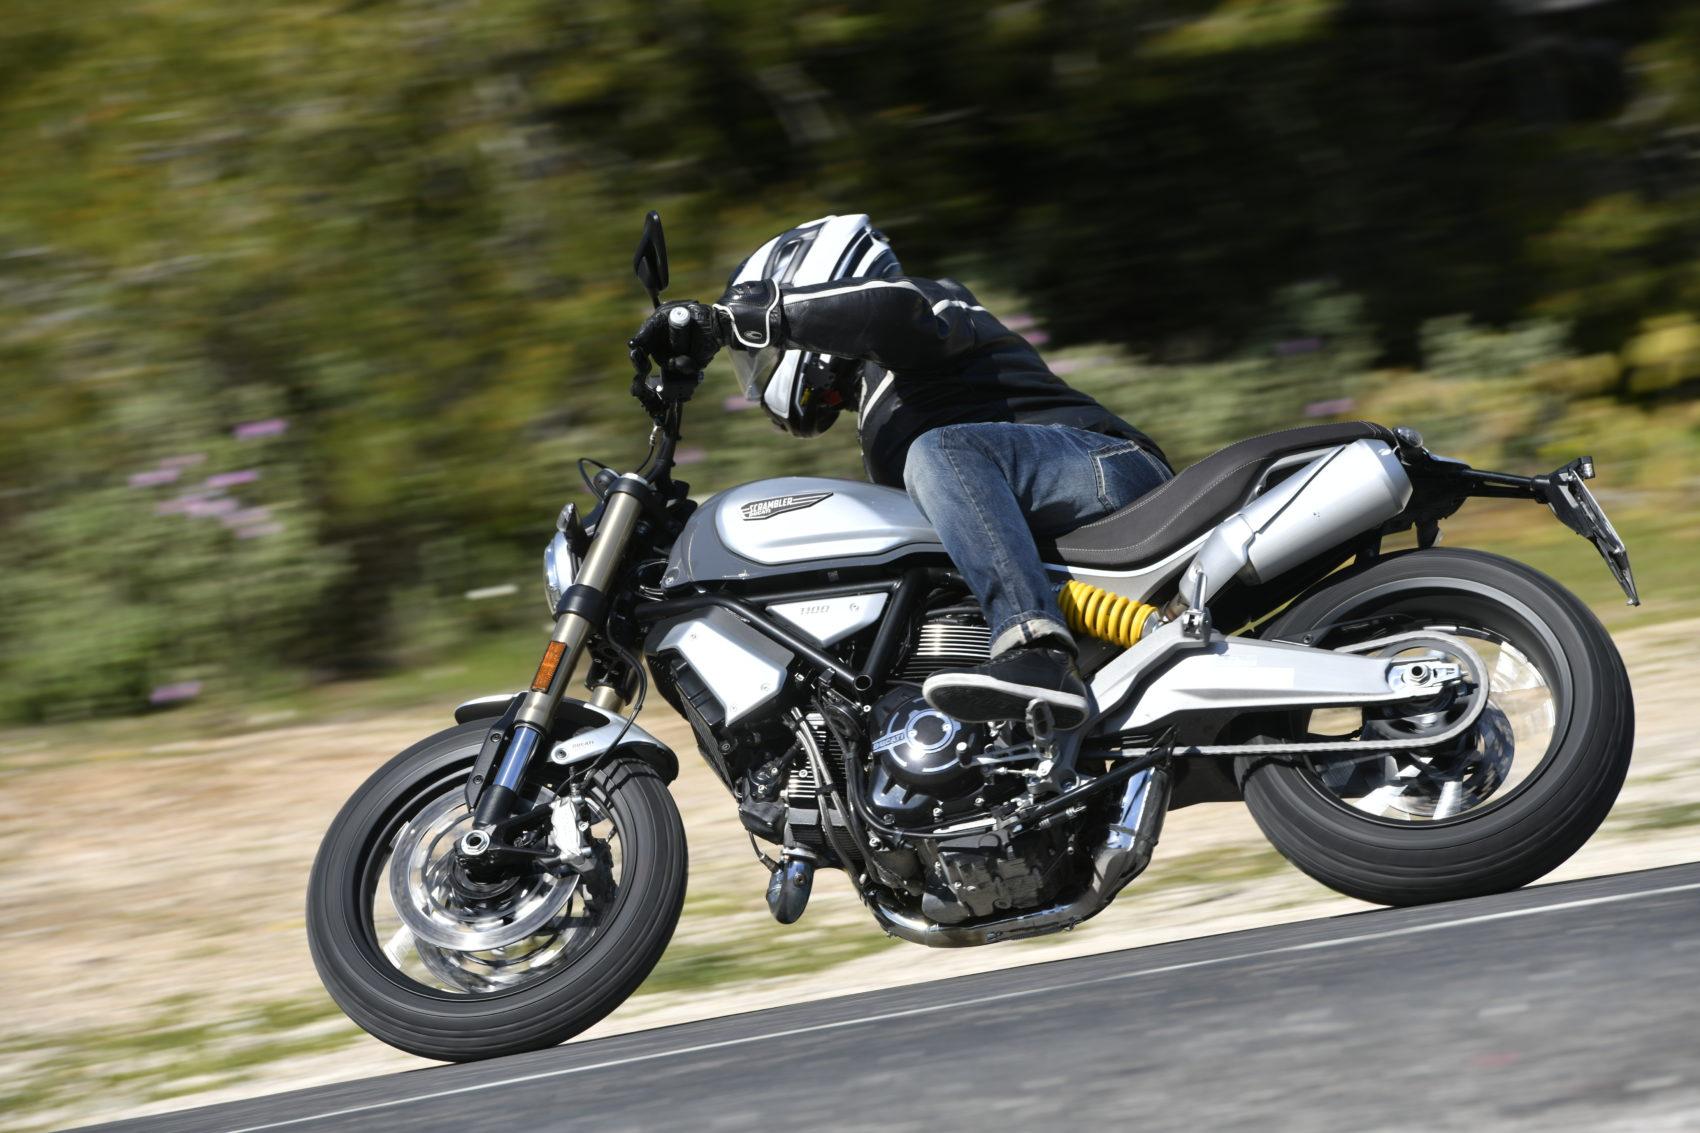 Scrambler Ducati 1100, c'est son moteur